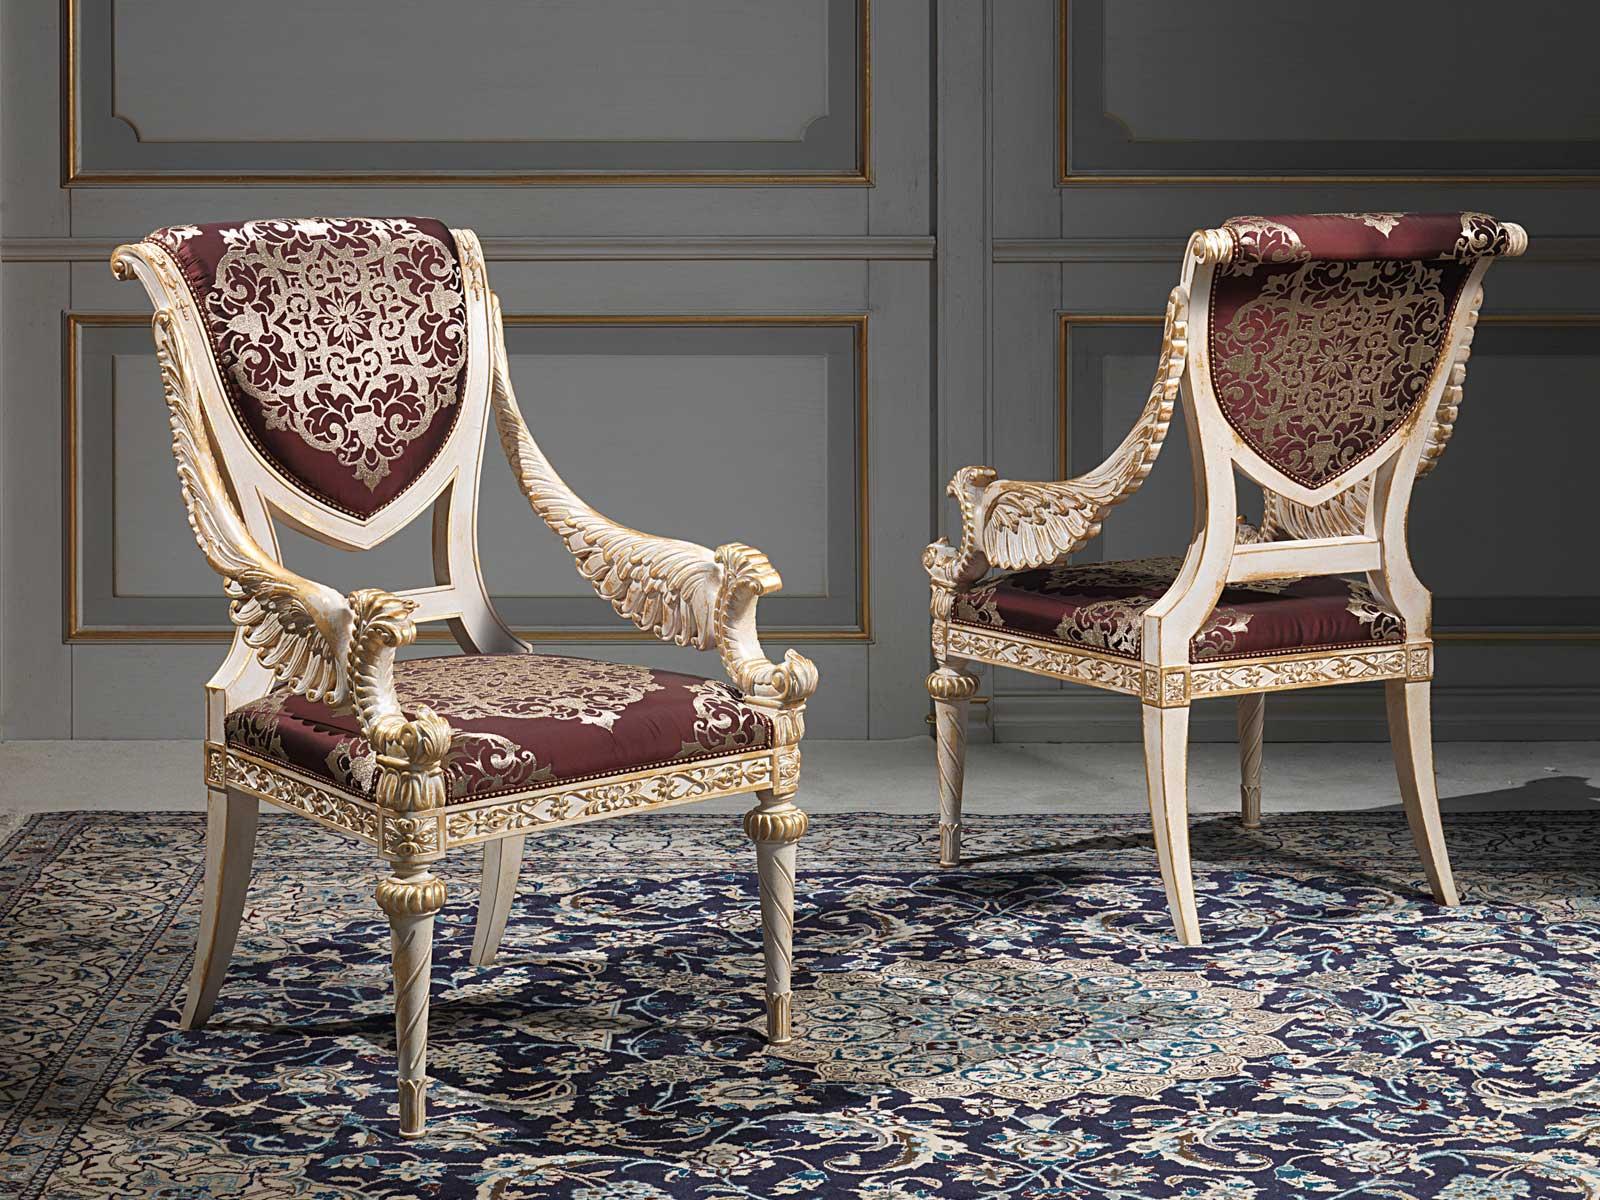 Chairs Louis Xvi Style Vimercati Classic Furniture